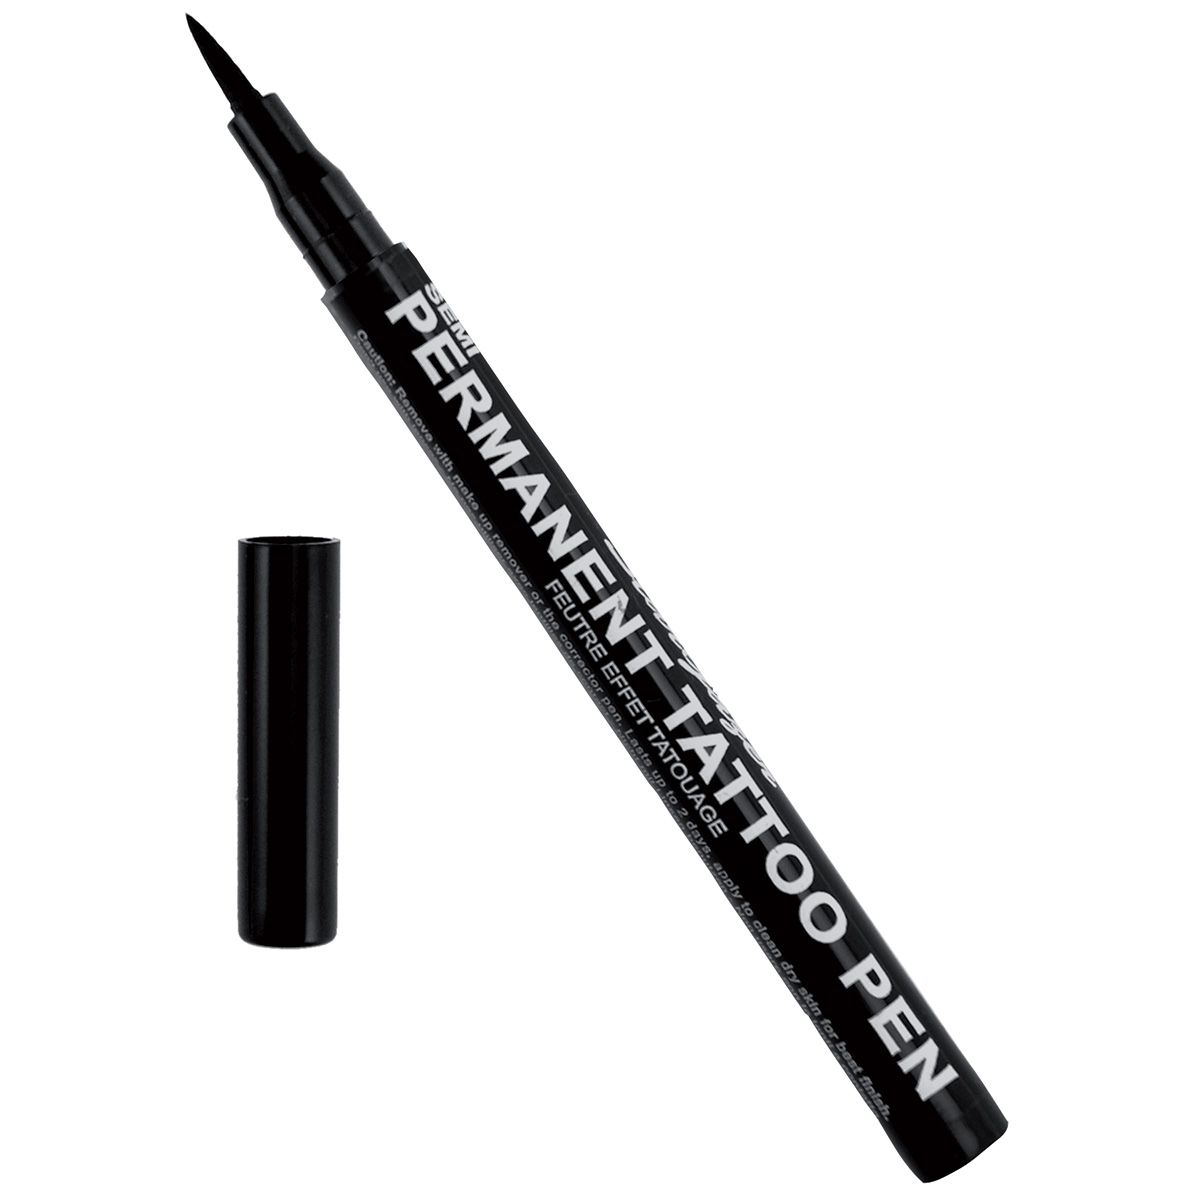 crayon tatouage stargazer feutre noir semi permanent crayons tatouages rock a gogo. Black Bedroom Furniture Sets. Home Design Ideas